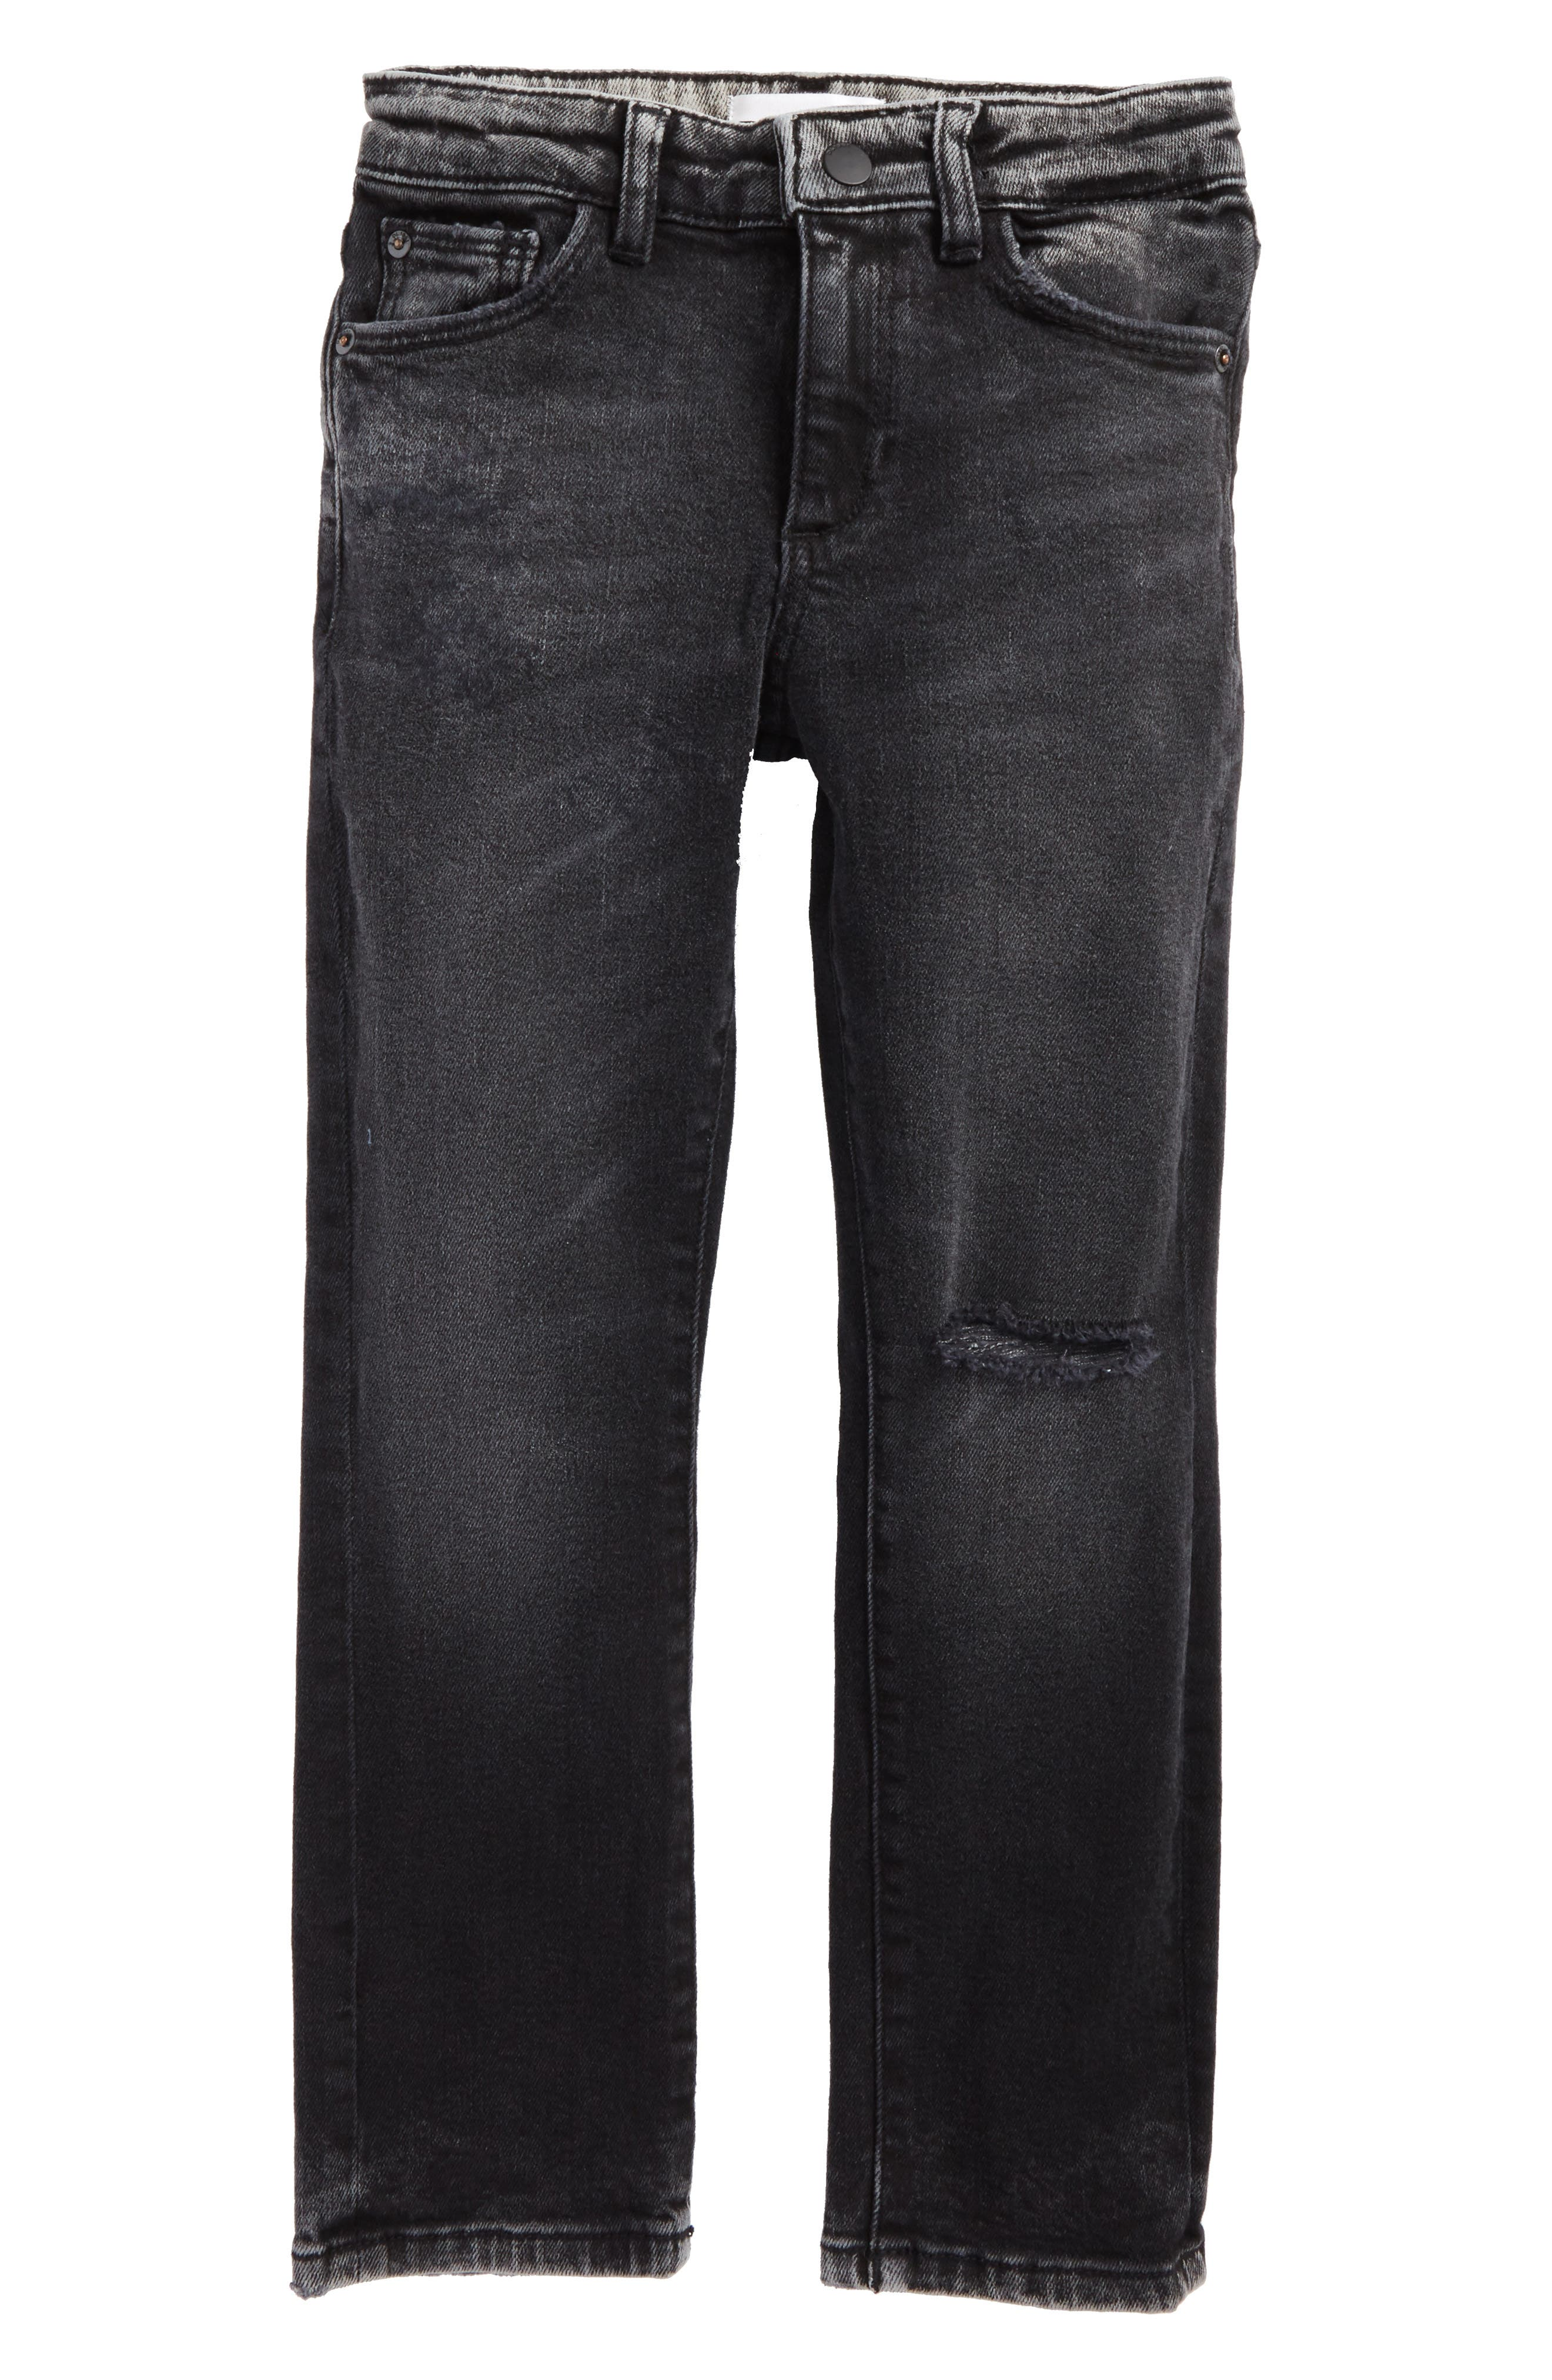 Hawke Skinny Jeans,                         Main,                         color, 020